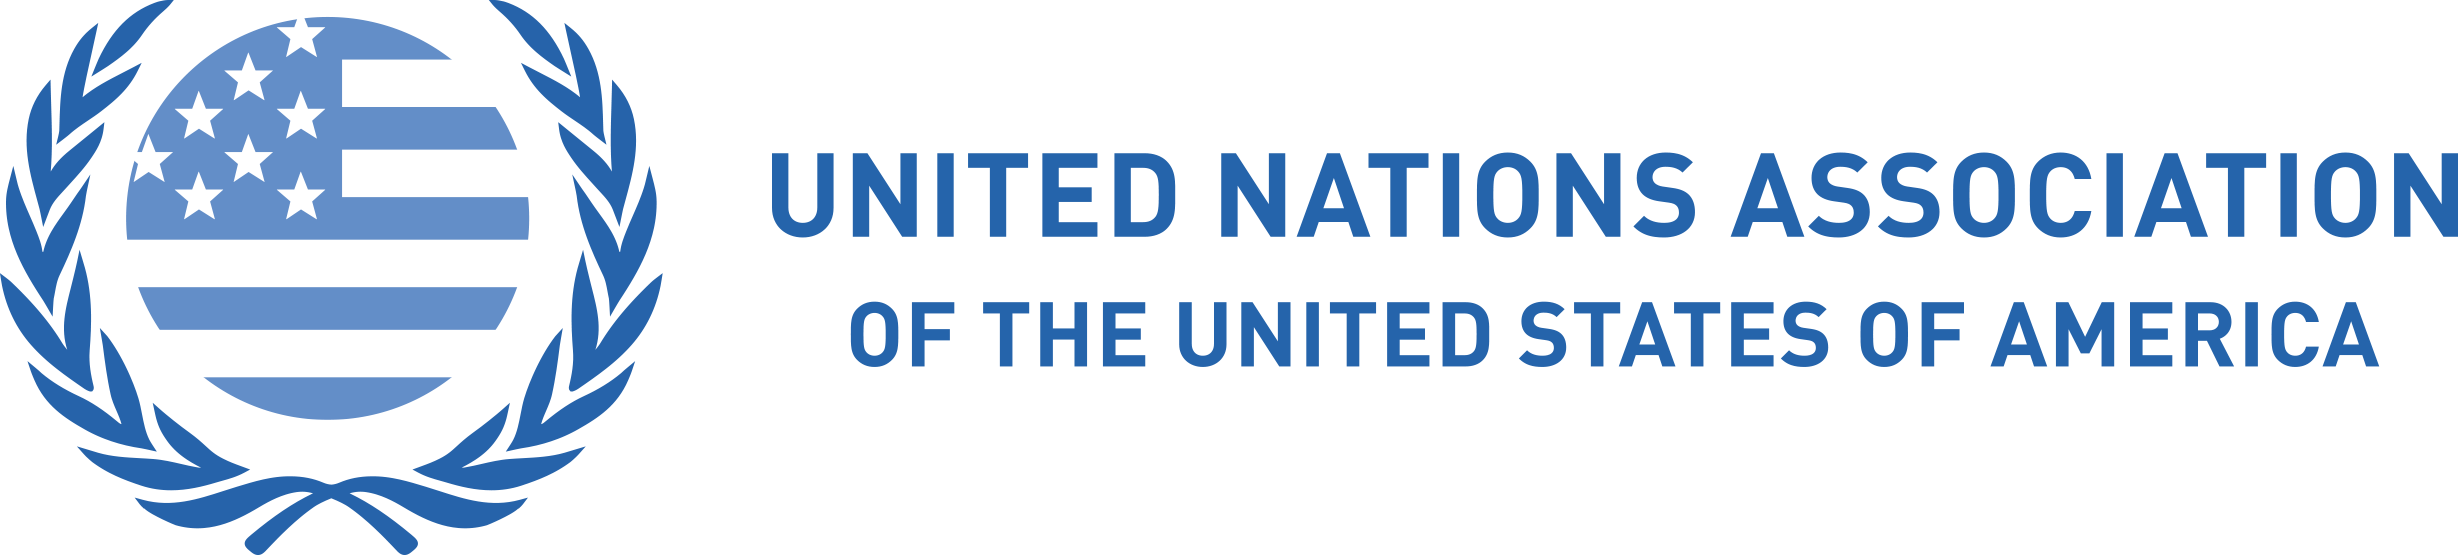 UNA-USA Primary 002_COLOR_Transparent.png